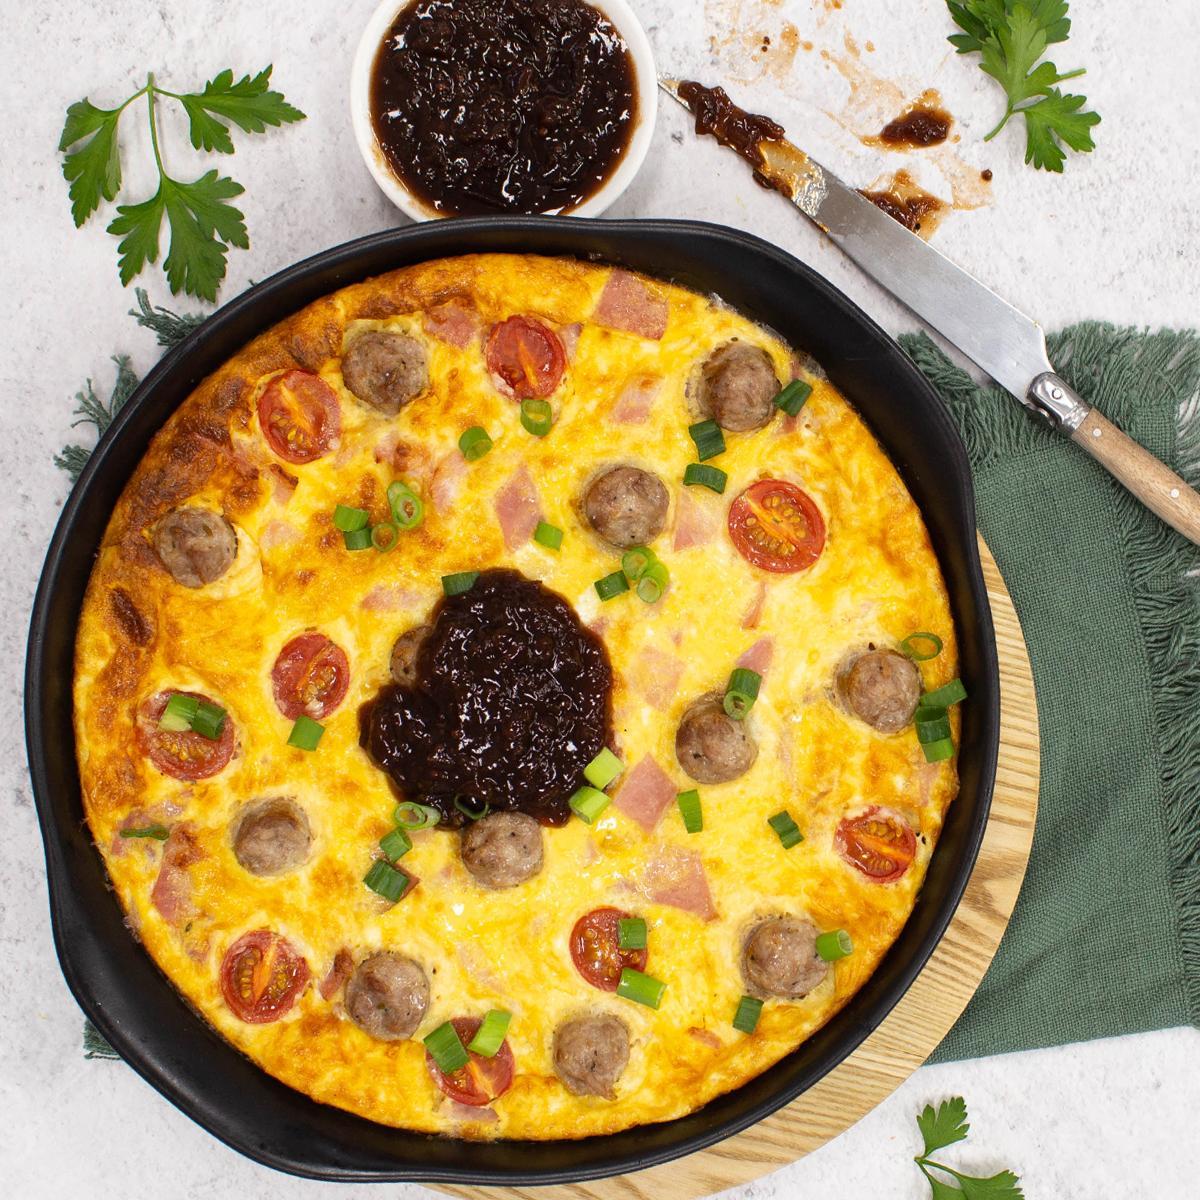 Sicilian Sausage Omlette